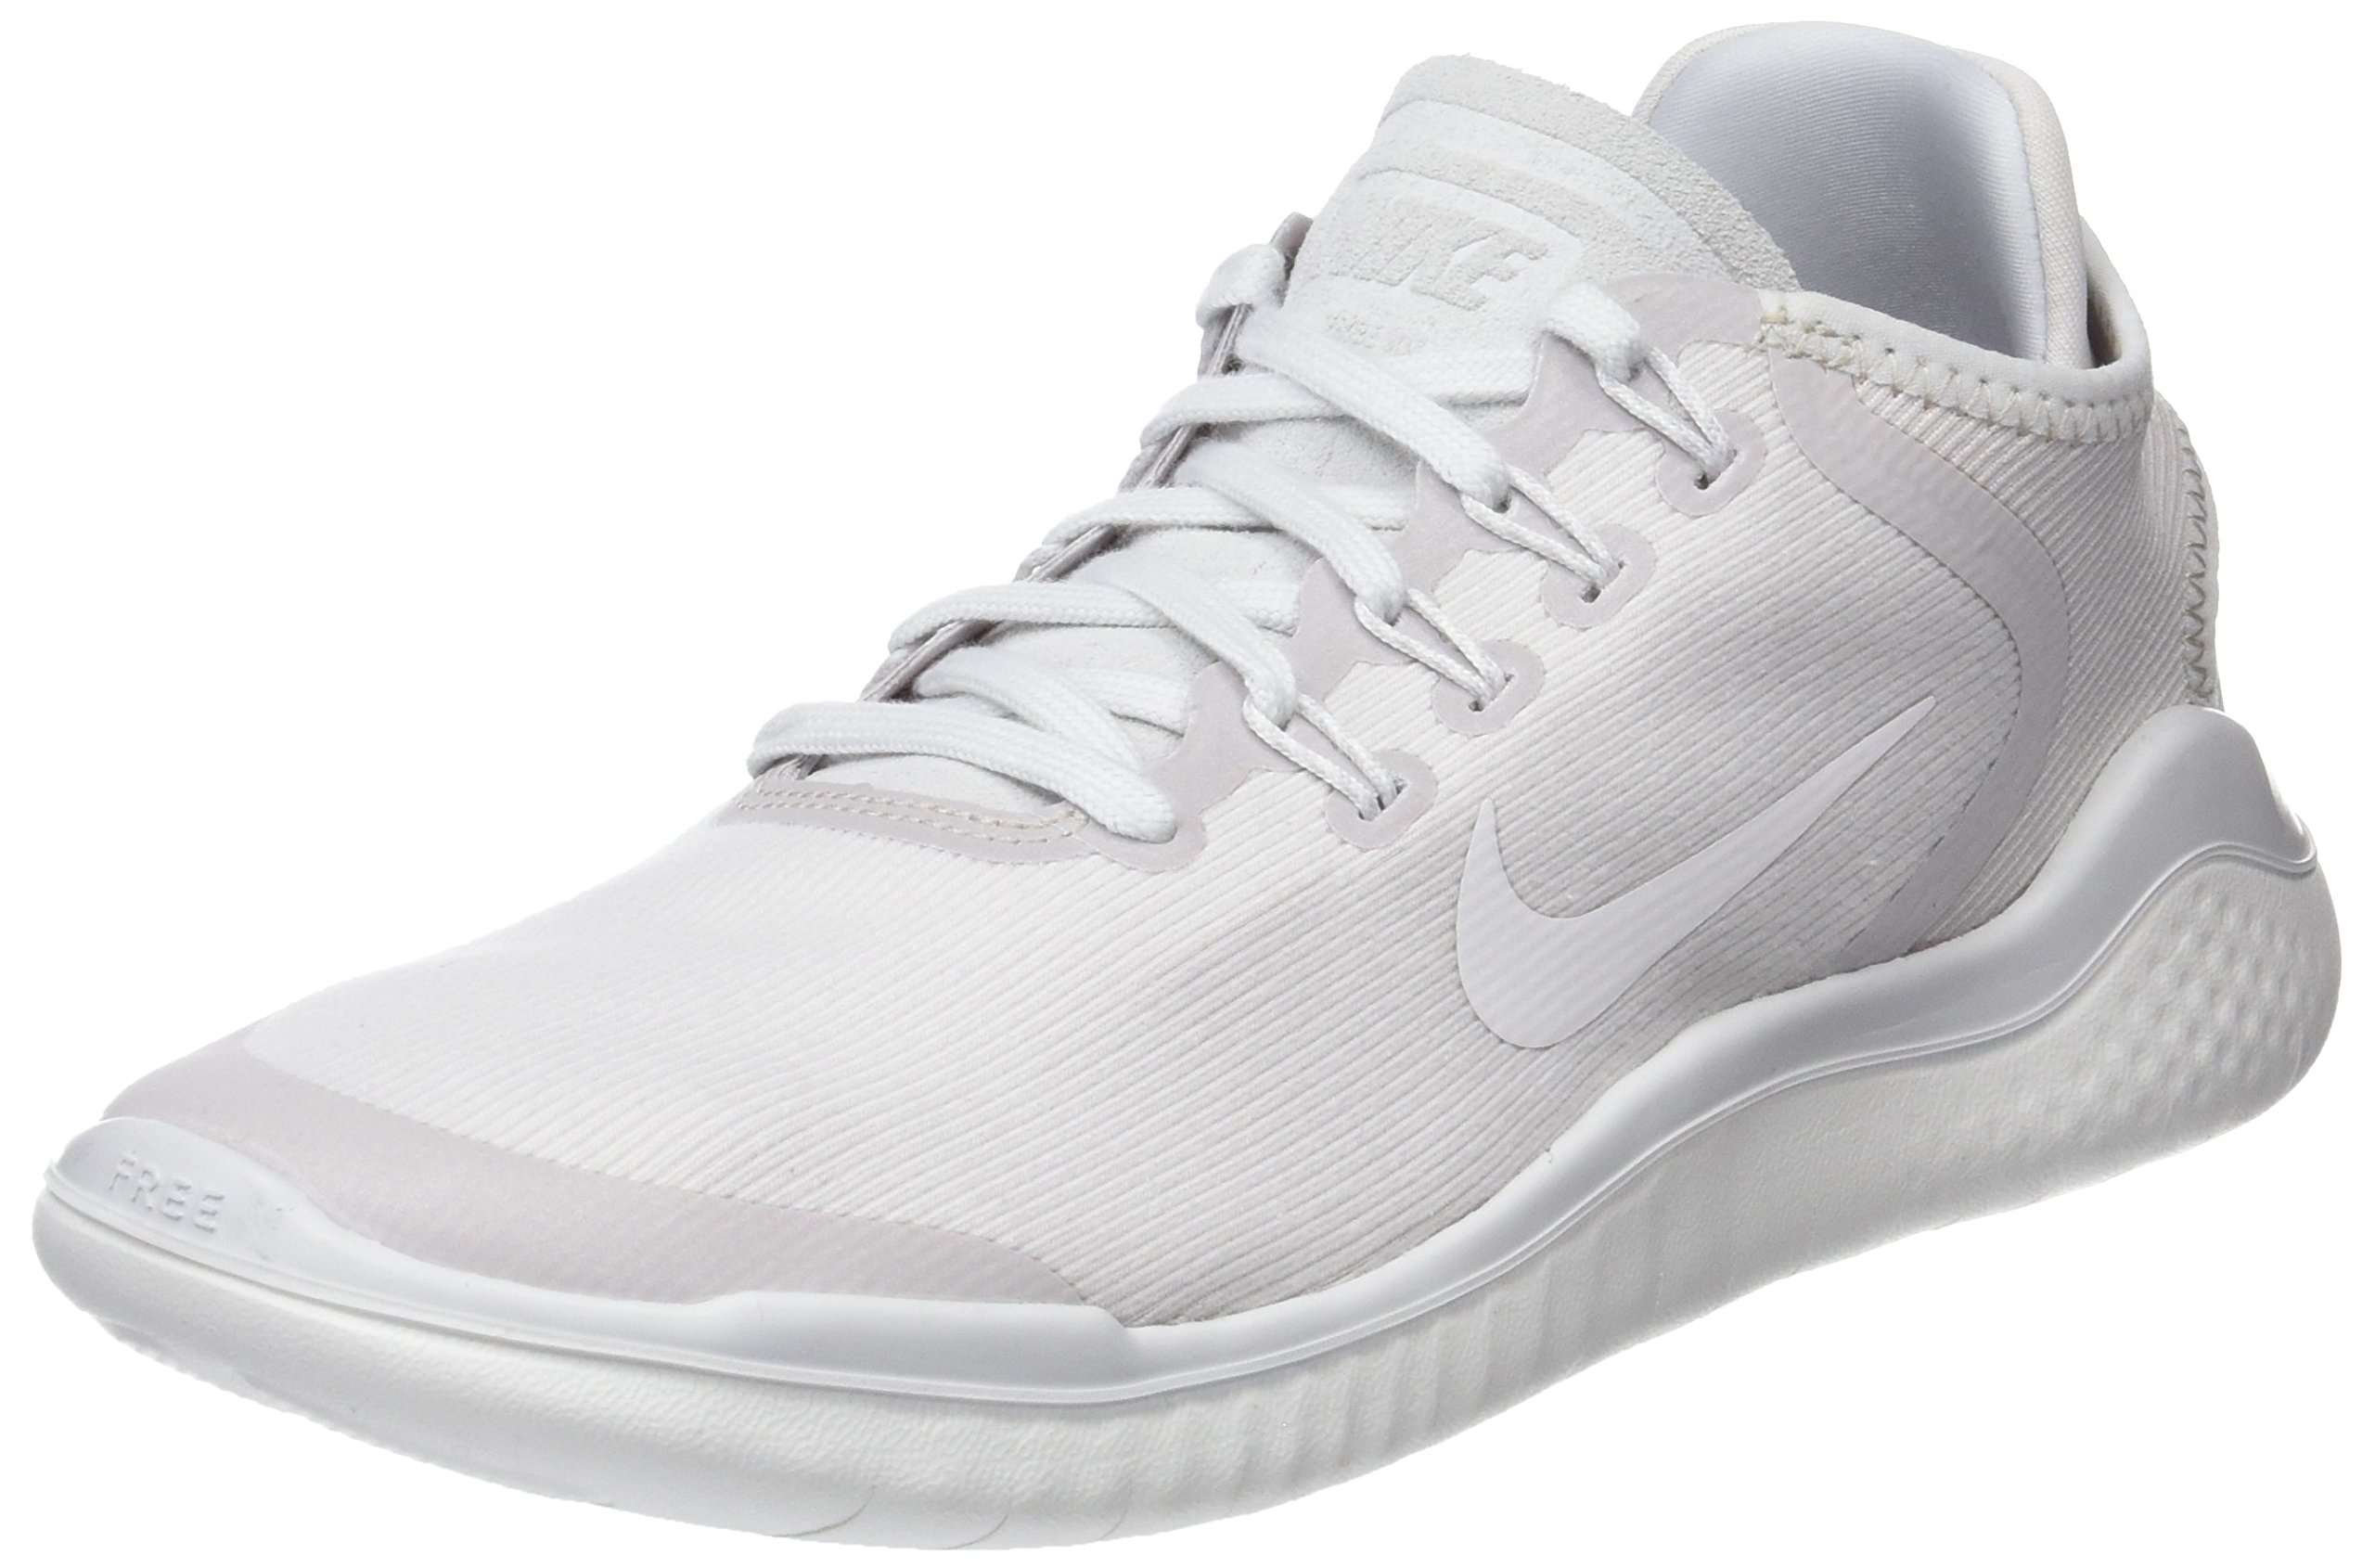 2e52acb62307 Galleon - Nike Women s Free Rn 2018 Running Shoe